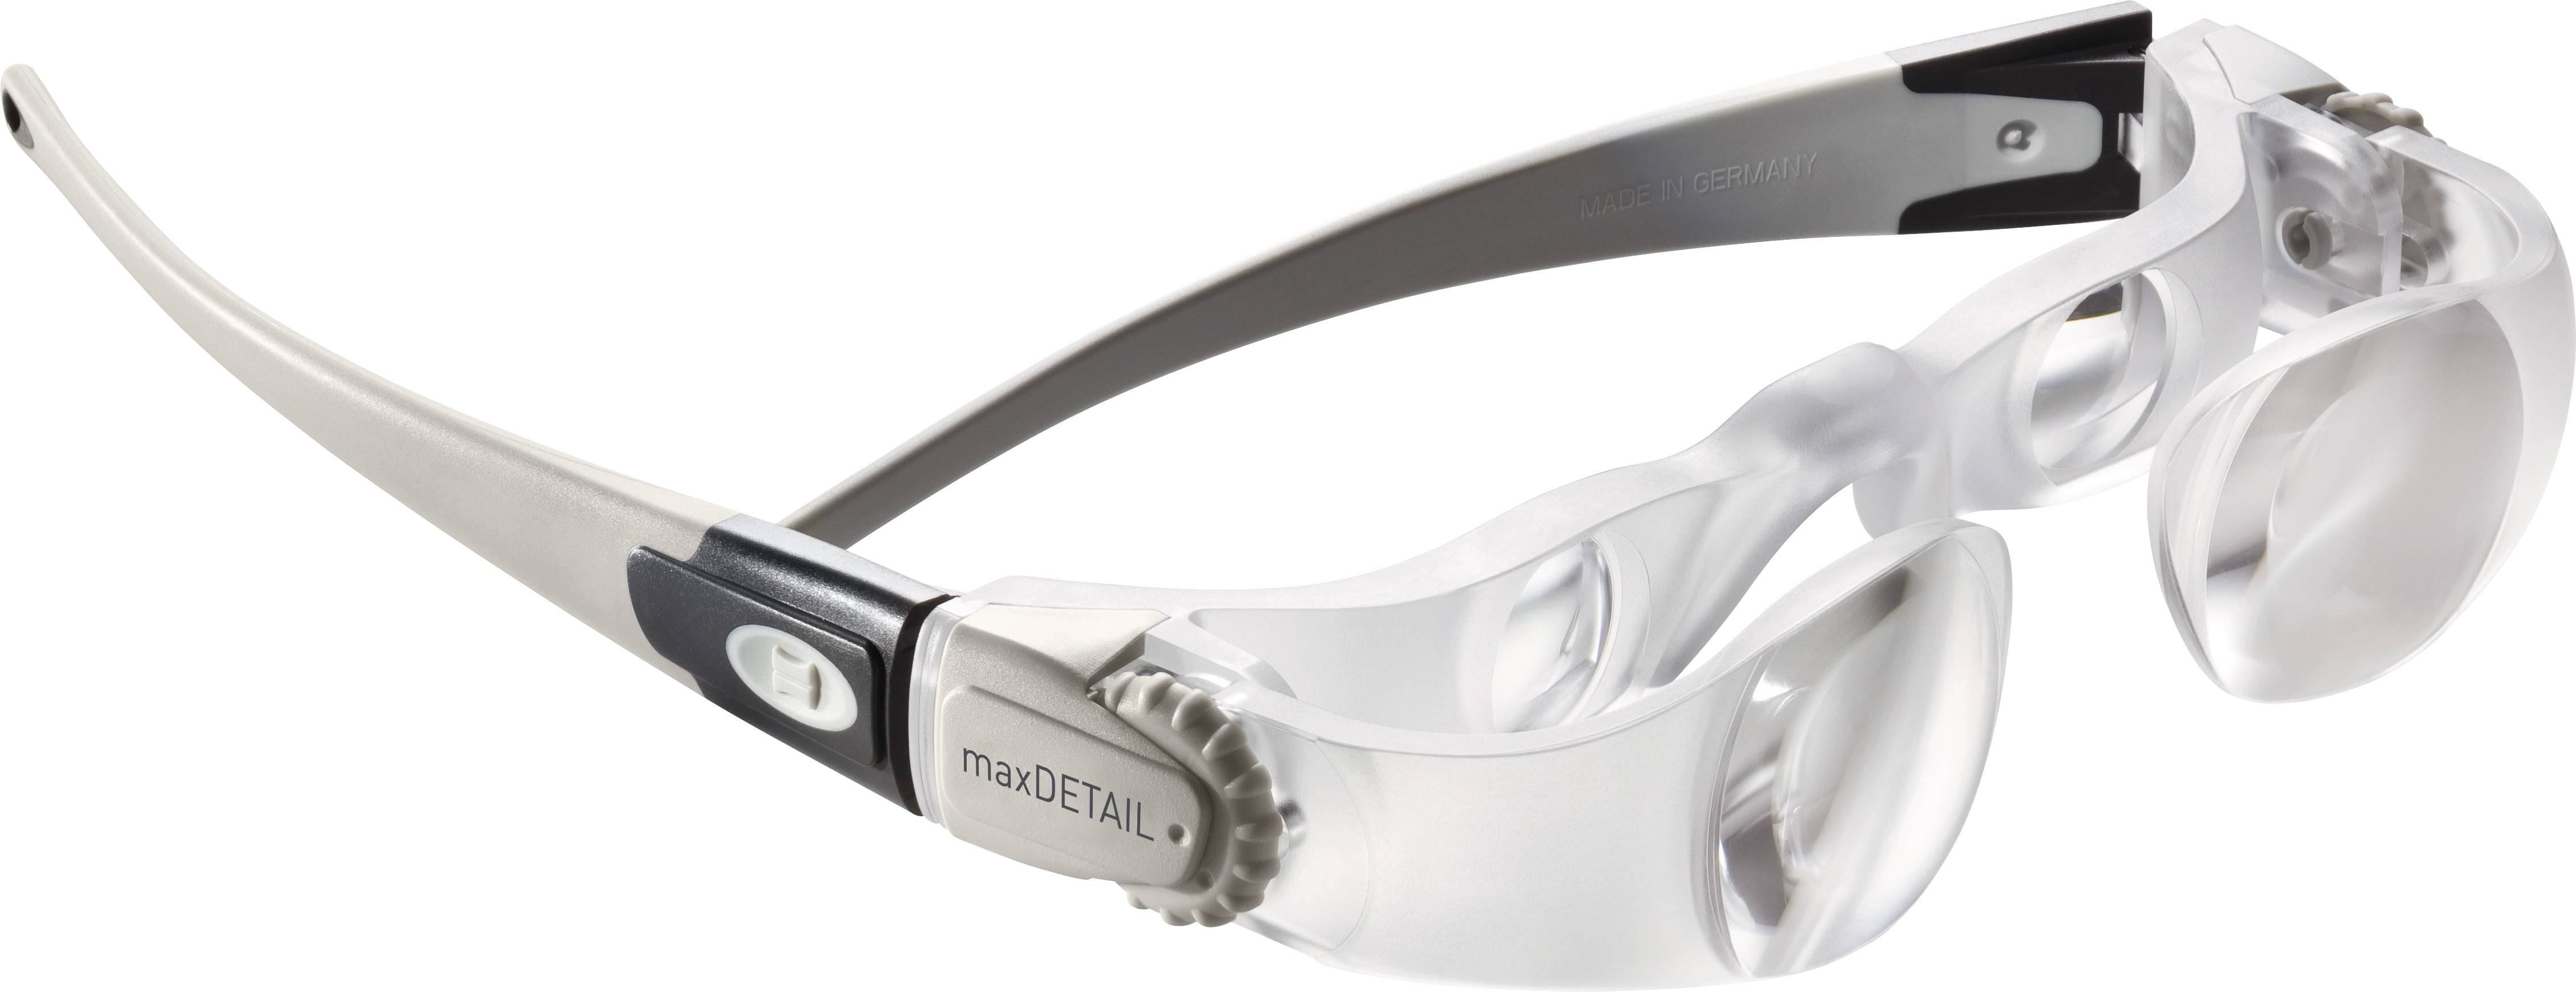 Loepbril Vergrotingsfactor: 2 x Eschenbach MAX DETAIL | Conrad.nl